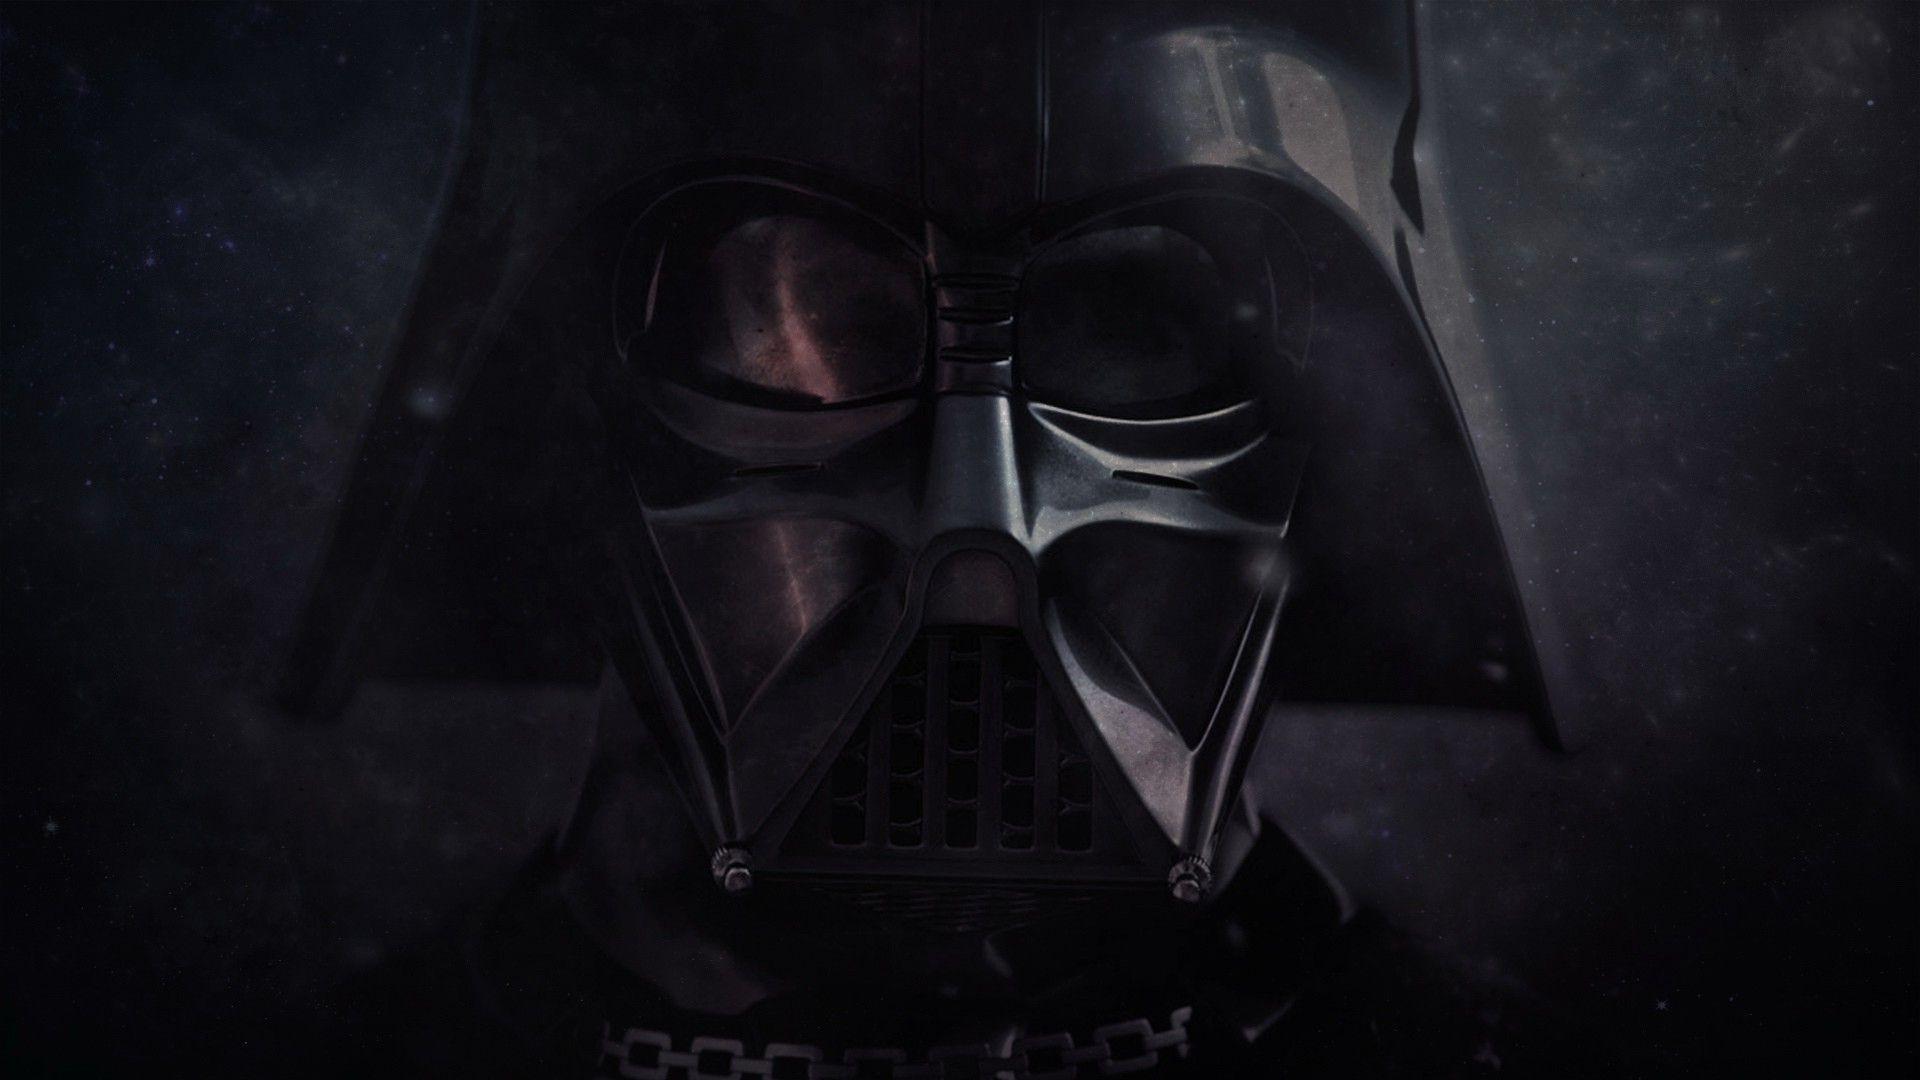 Darth Vader Live Wallpaper Android Apps on Google Play   HD Wallpapers    Pinterest   Darth vader, Wallpaper and Wallpapers android